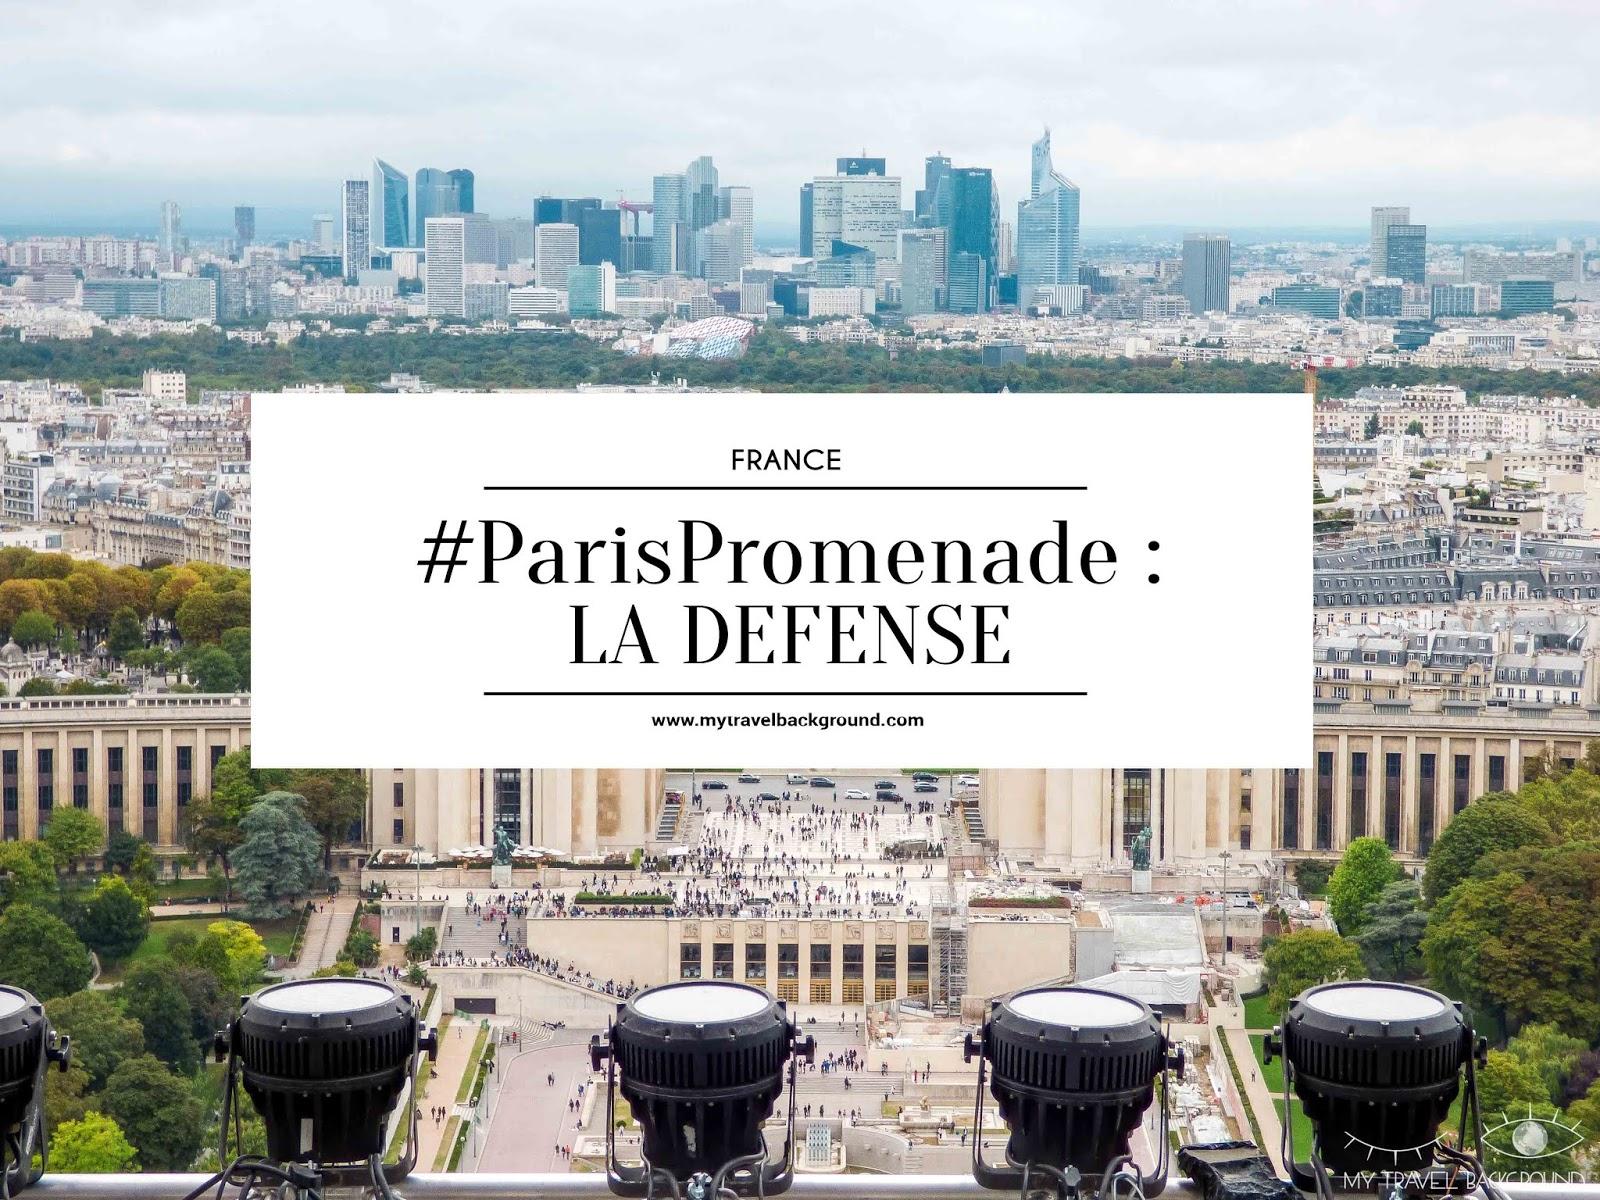 My Travel Background : Paris Promenade La Défense